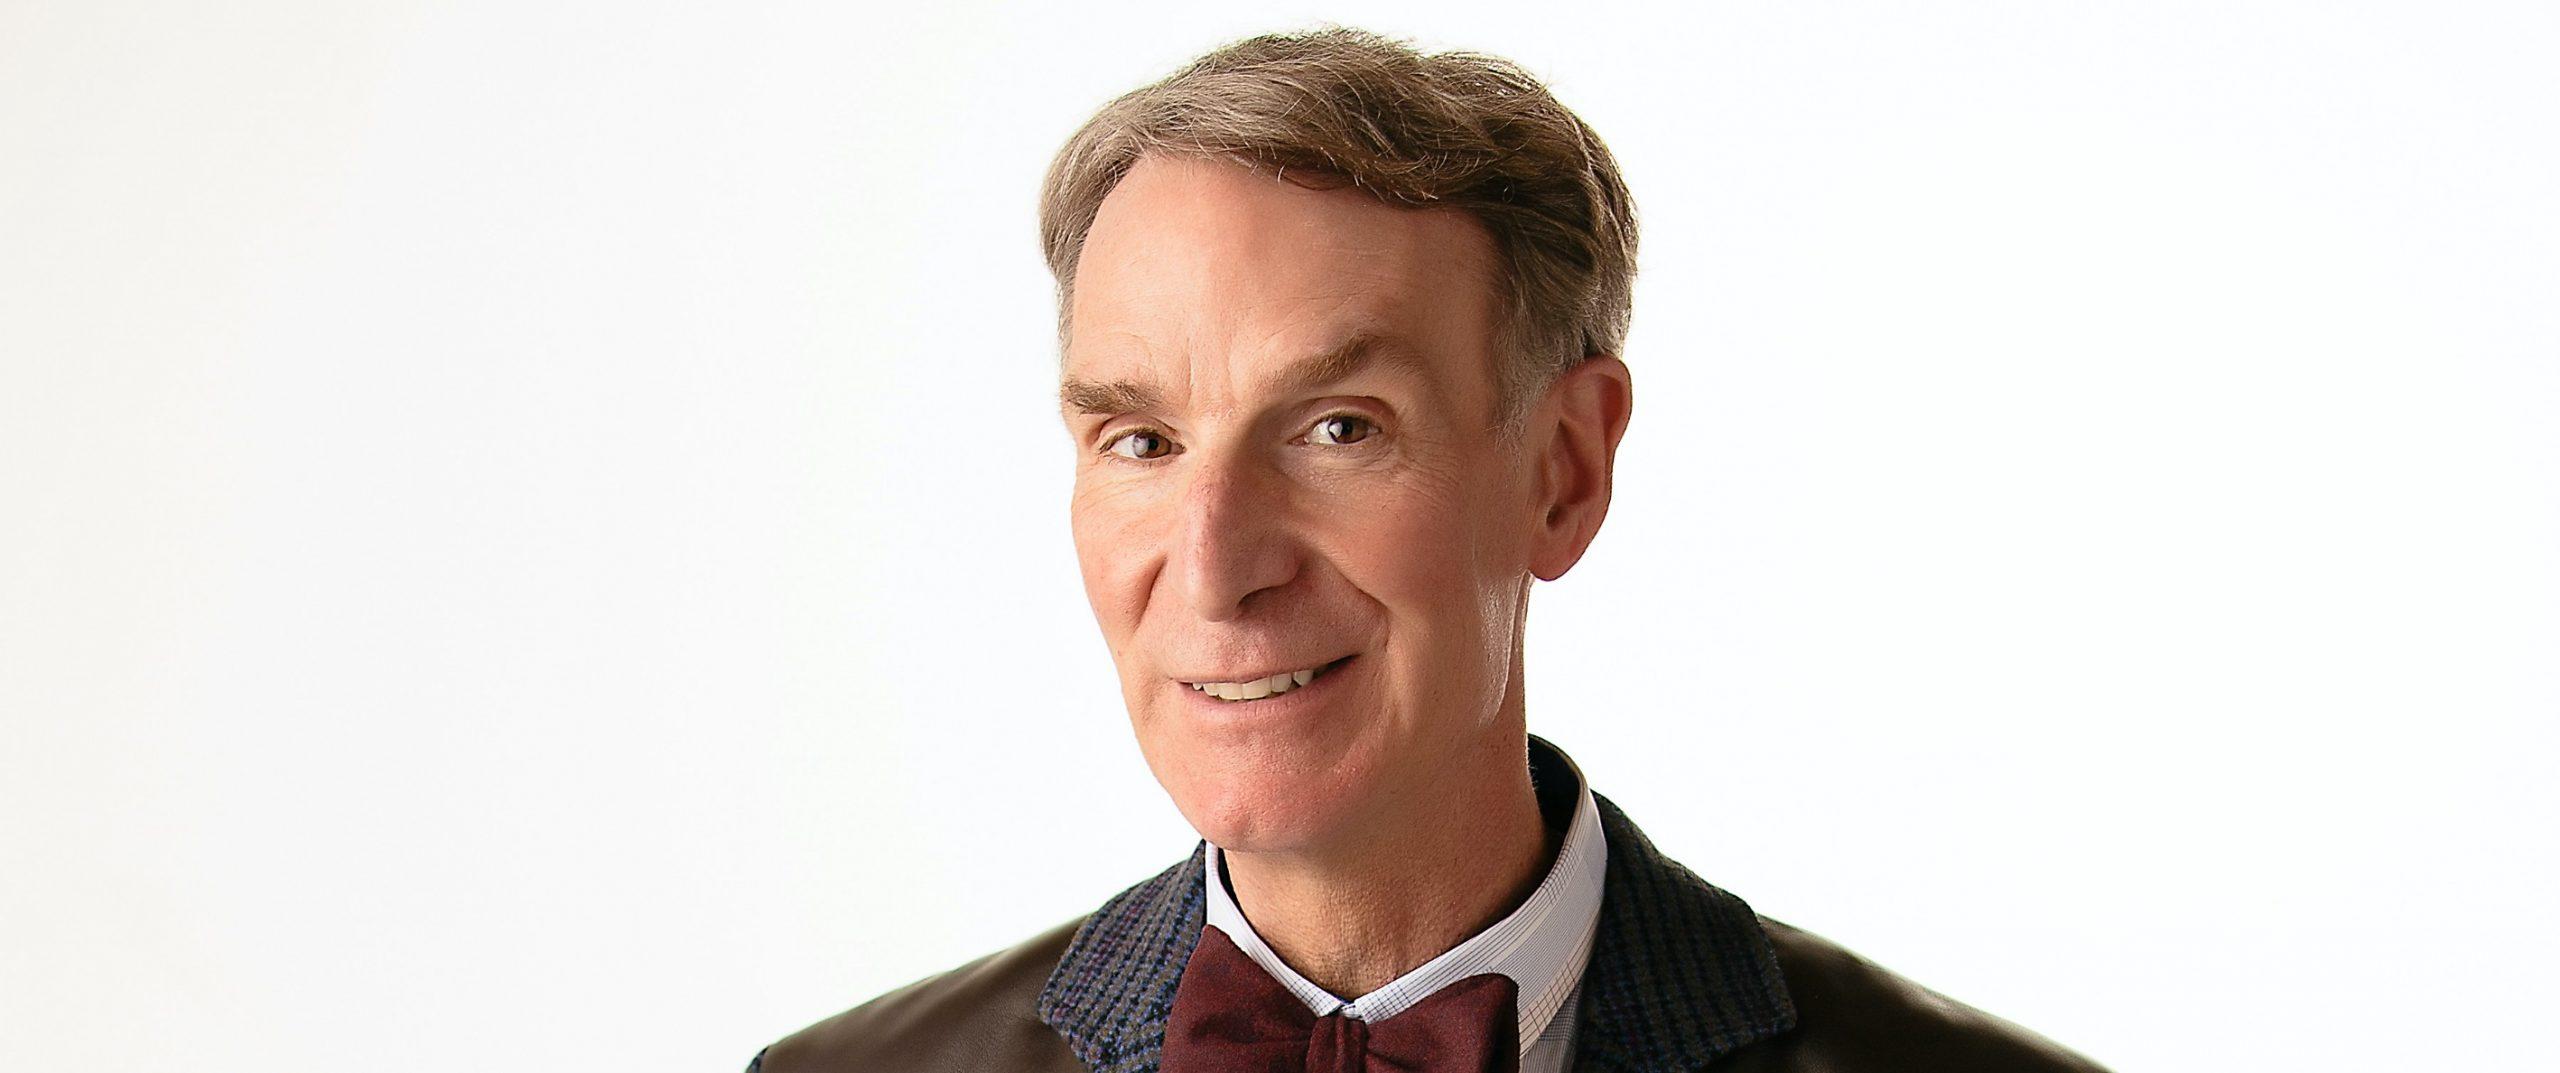 Bill Nye the Science Guy. Source: Bill Nye